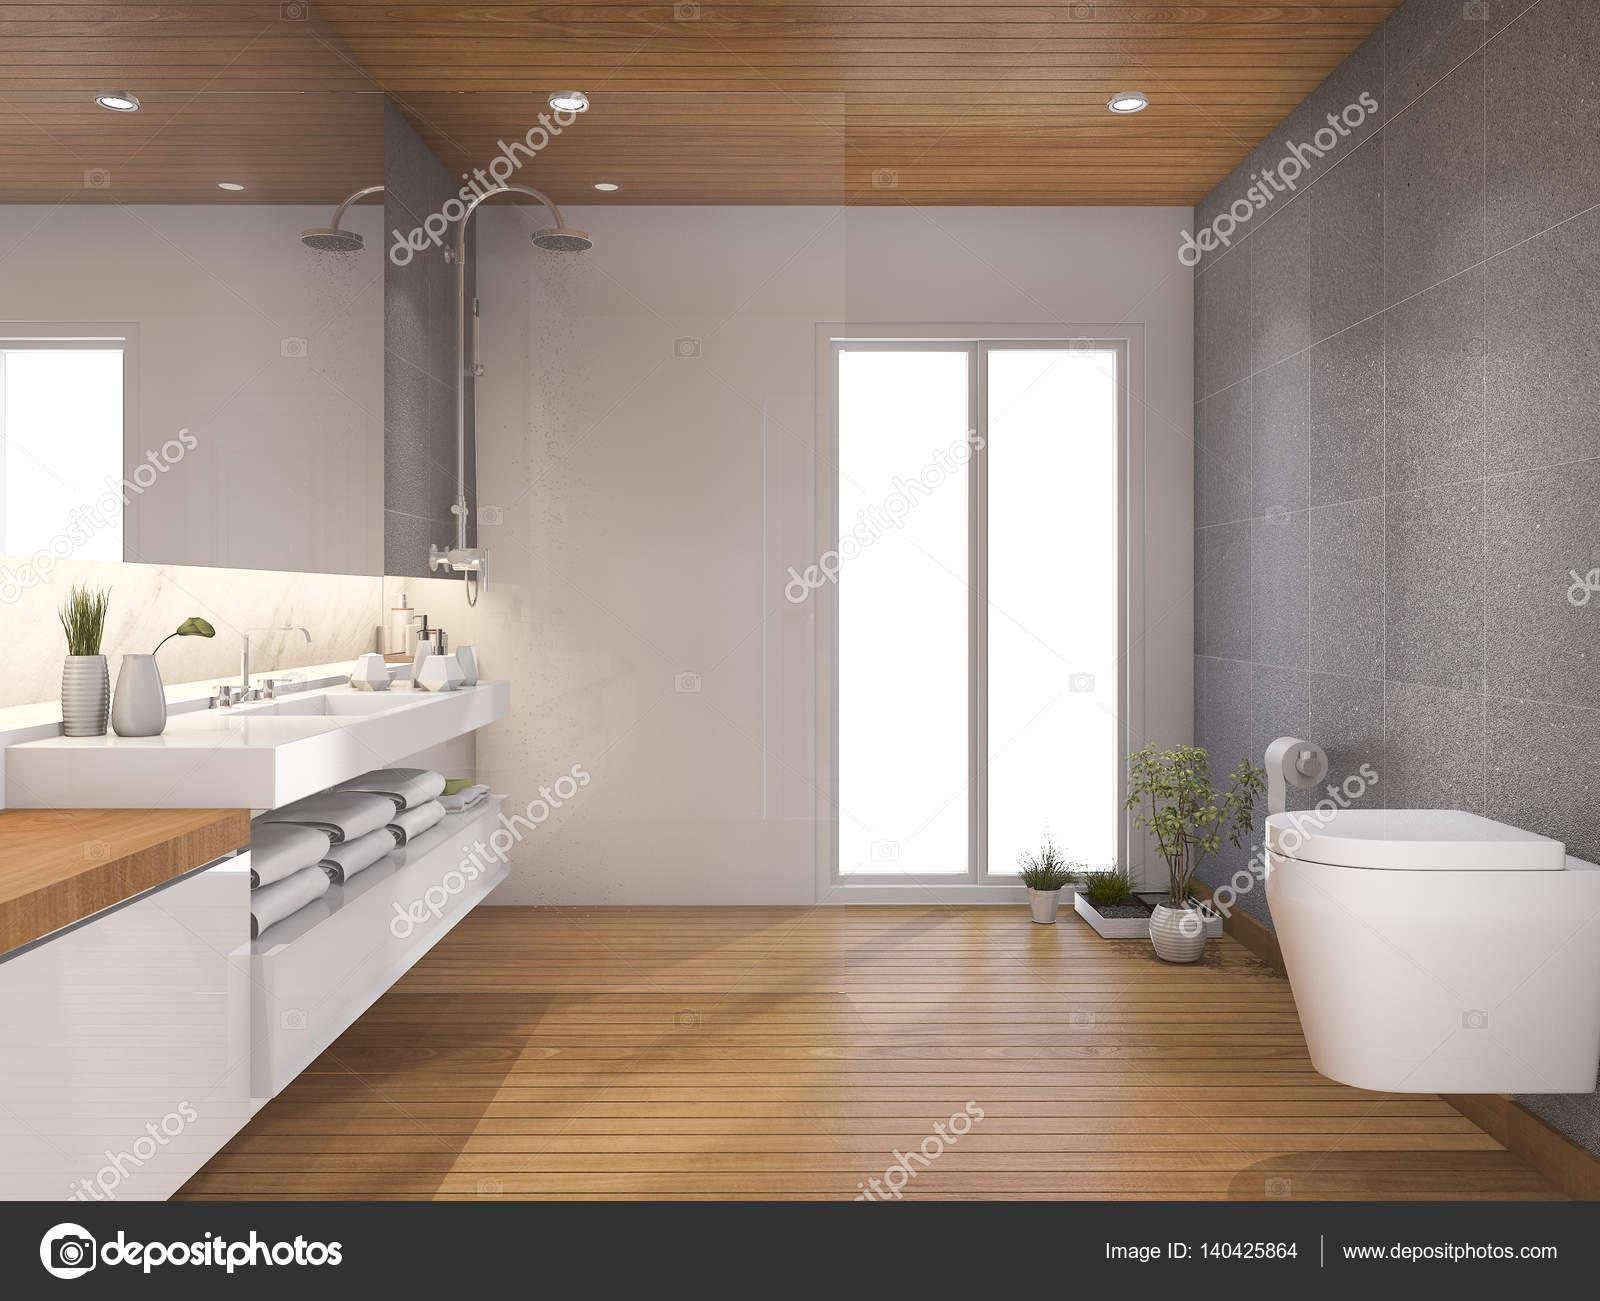 D rendering moderne hout badkamer en toilet in de buurt van